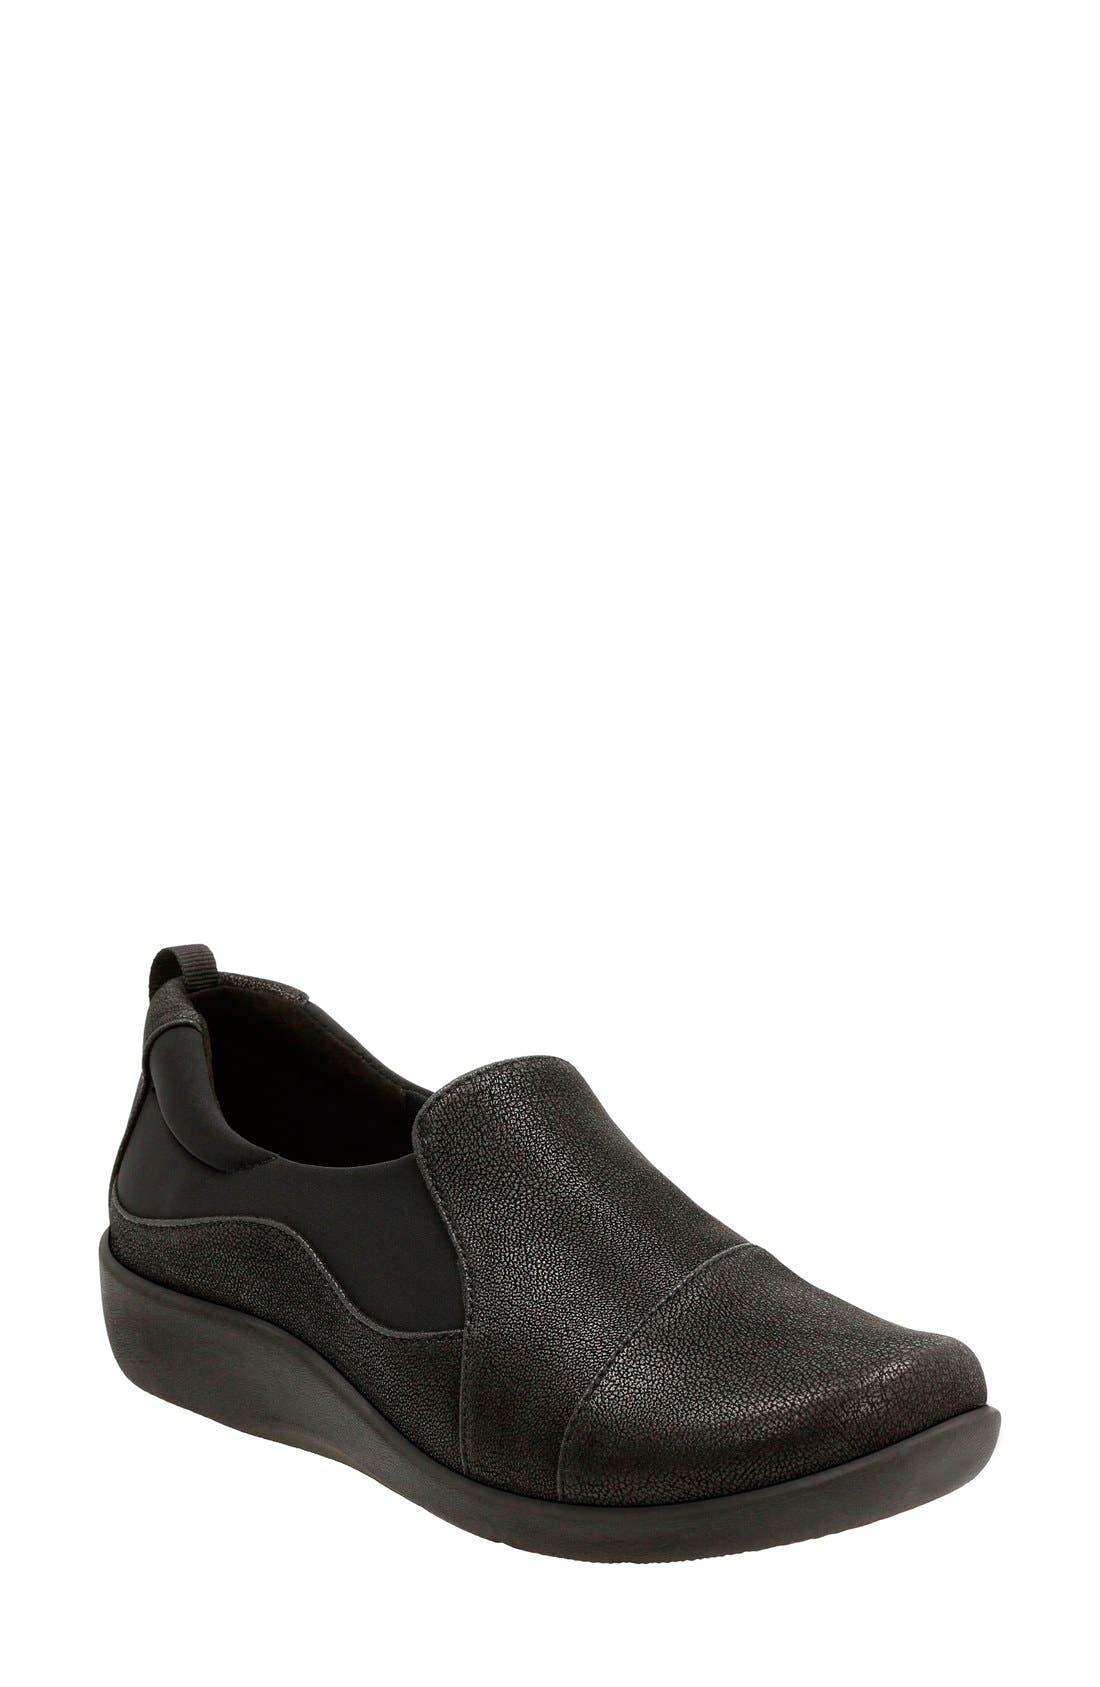 CLARKS® 'Sillian Paz' Slip-On Sneaker